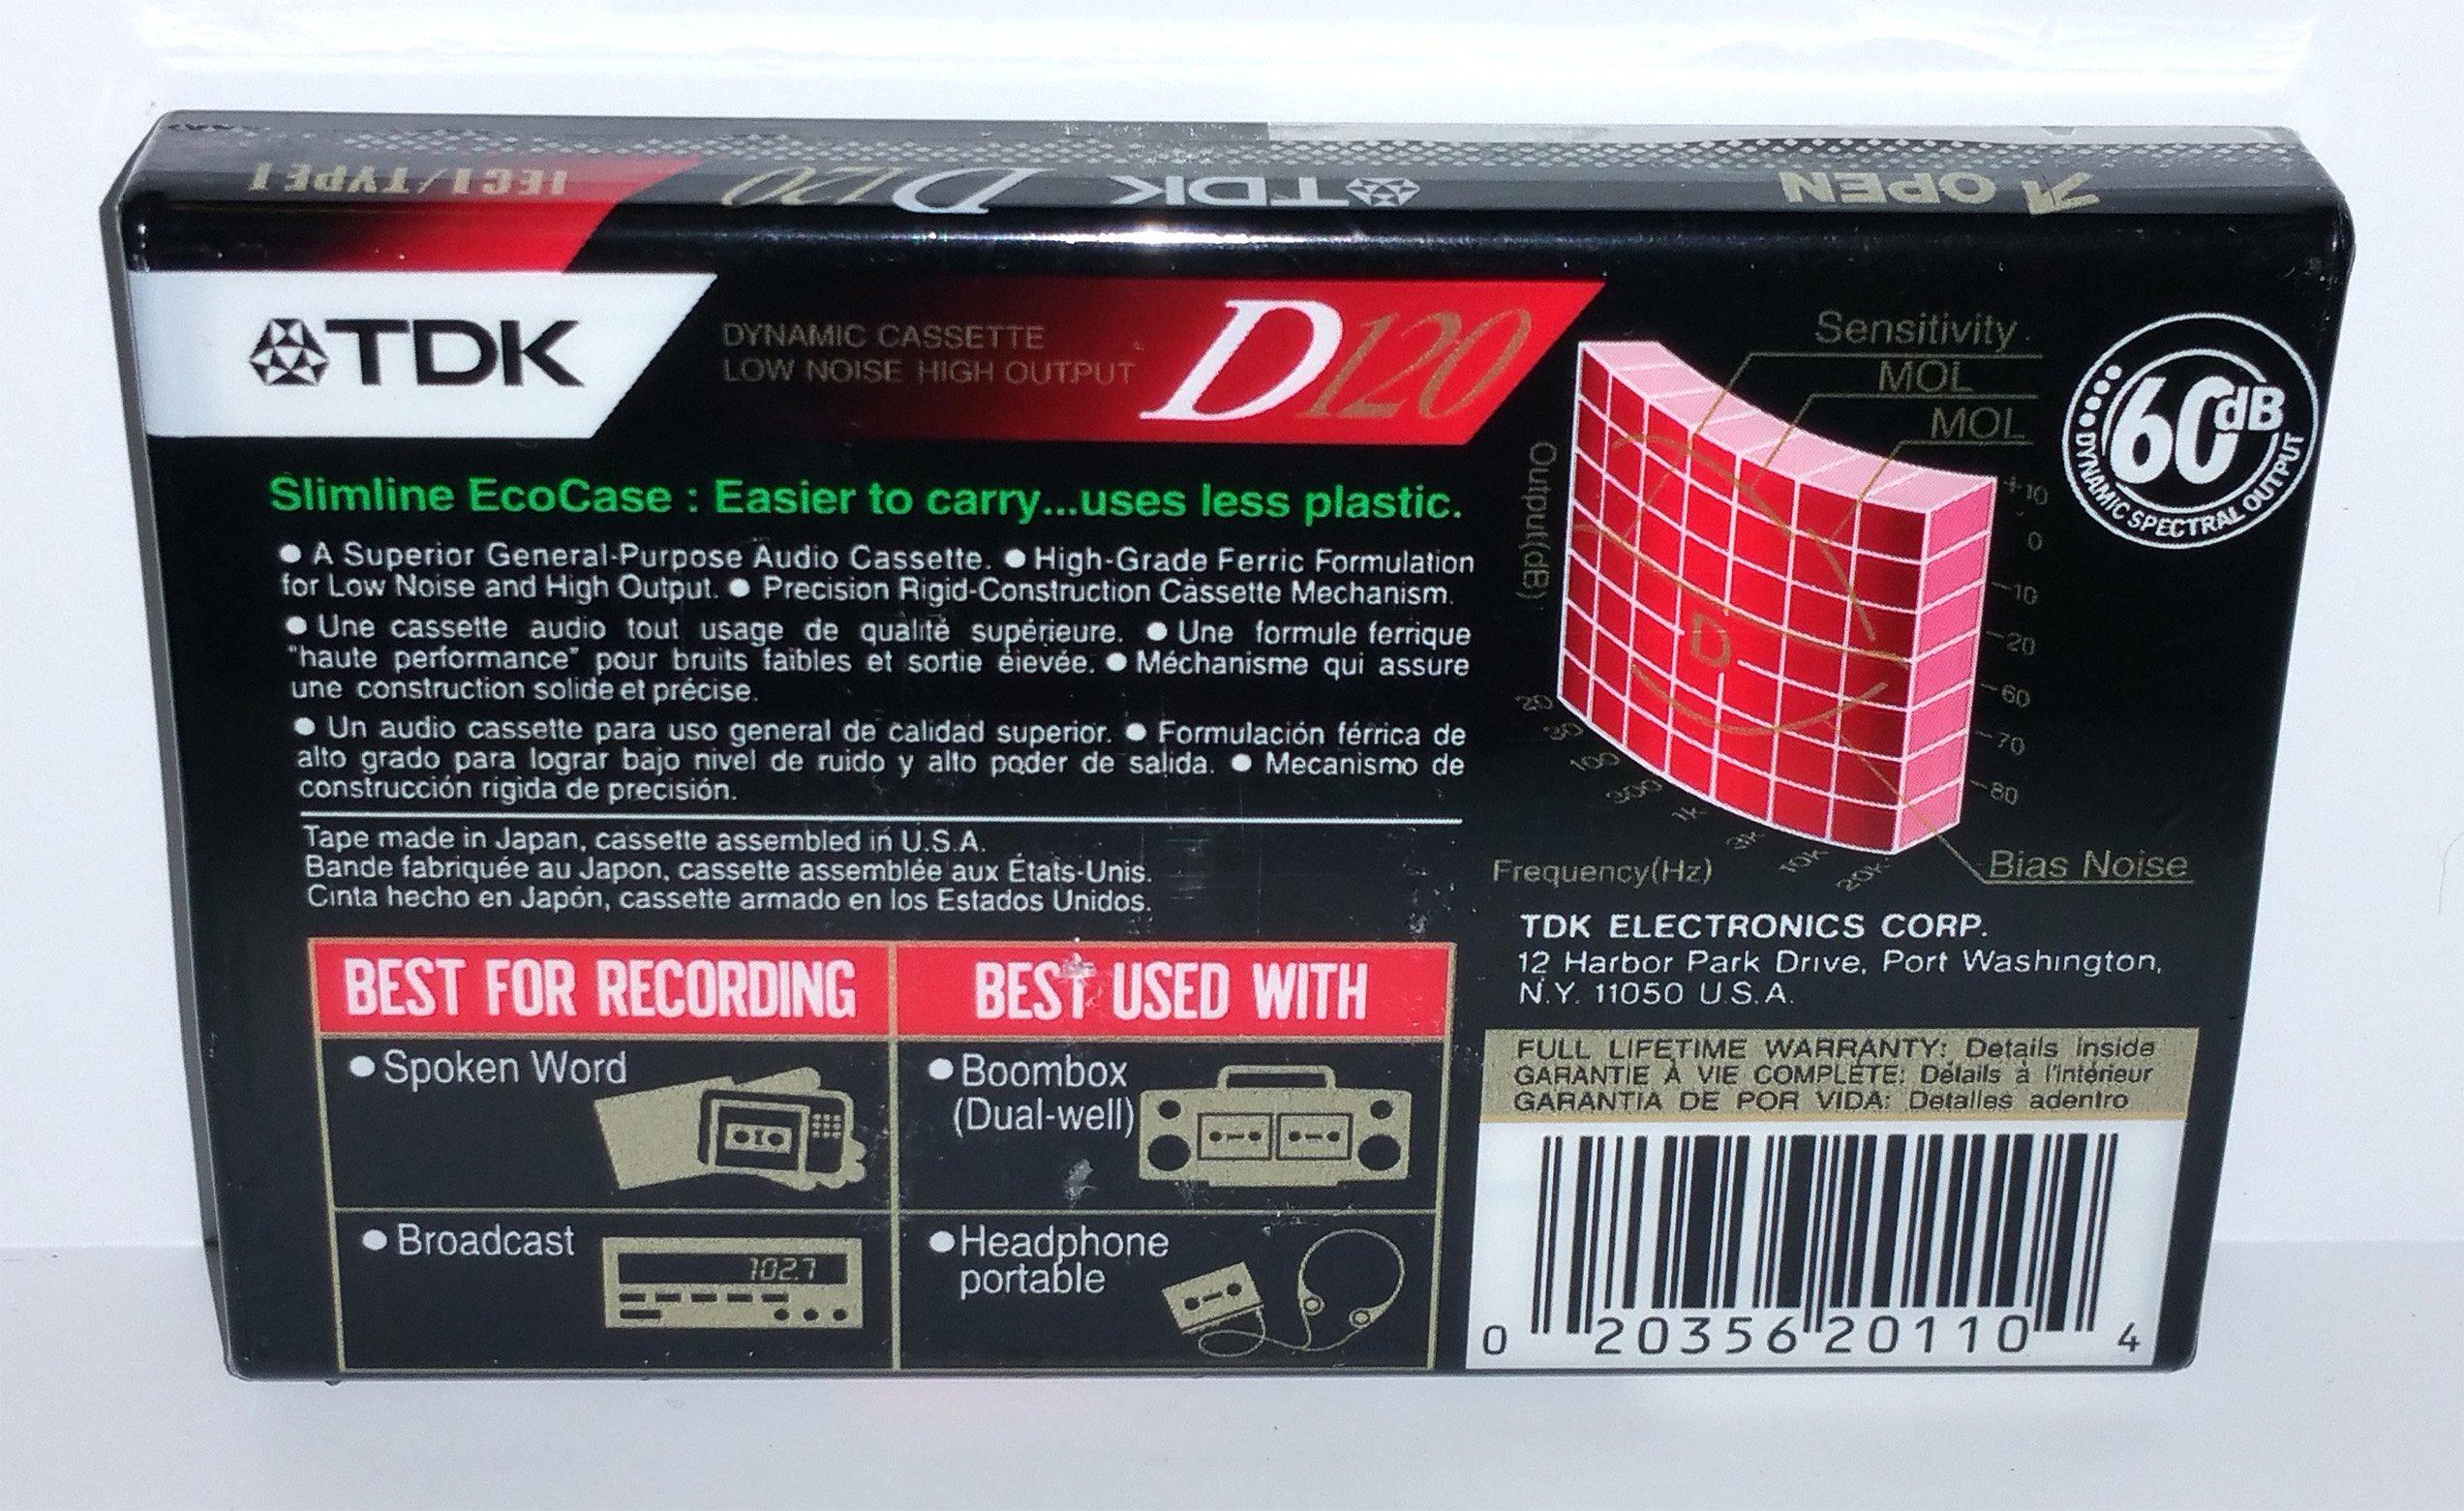 TDK D120 High Output Precision Rigid Construction Mechanism IEC I / Type I Normal Bias Audio Cassette Tapes - 5 Pack